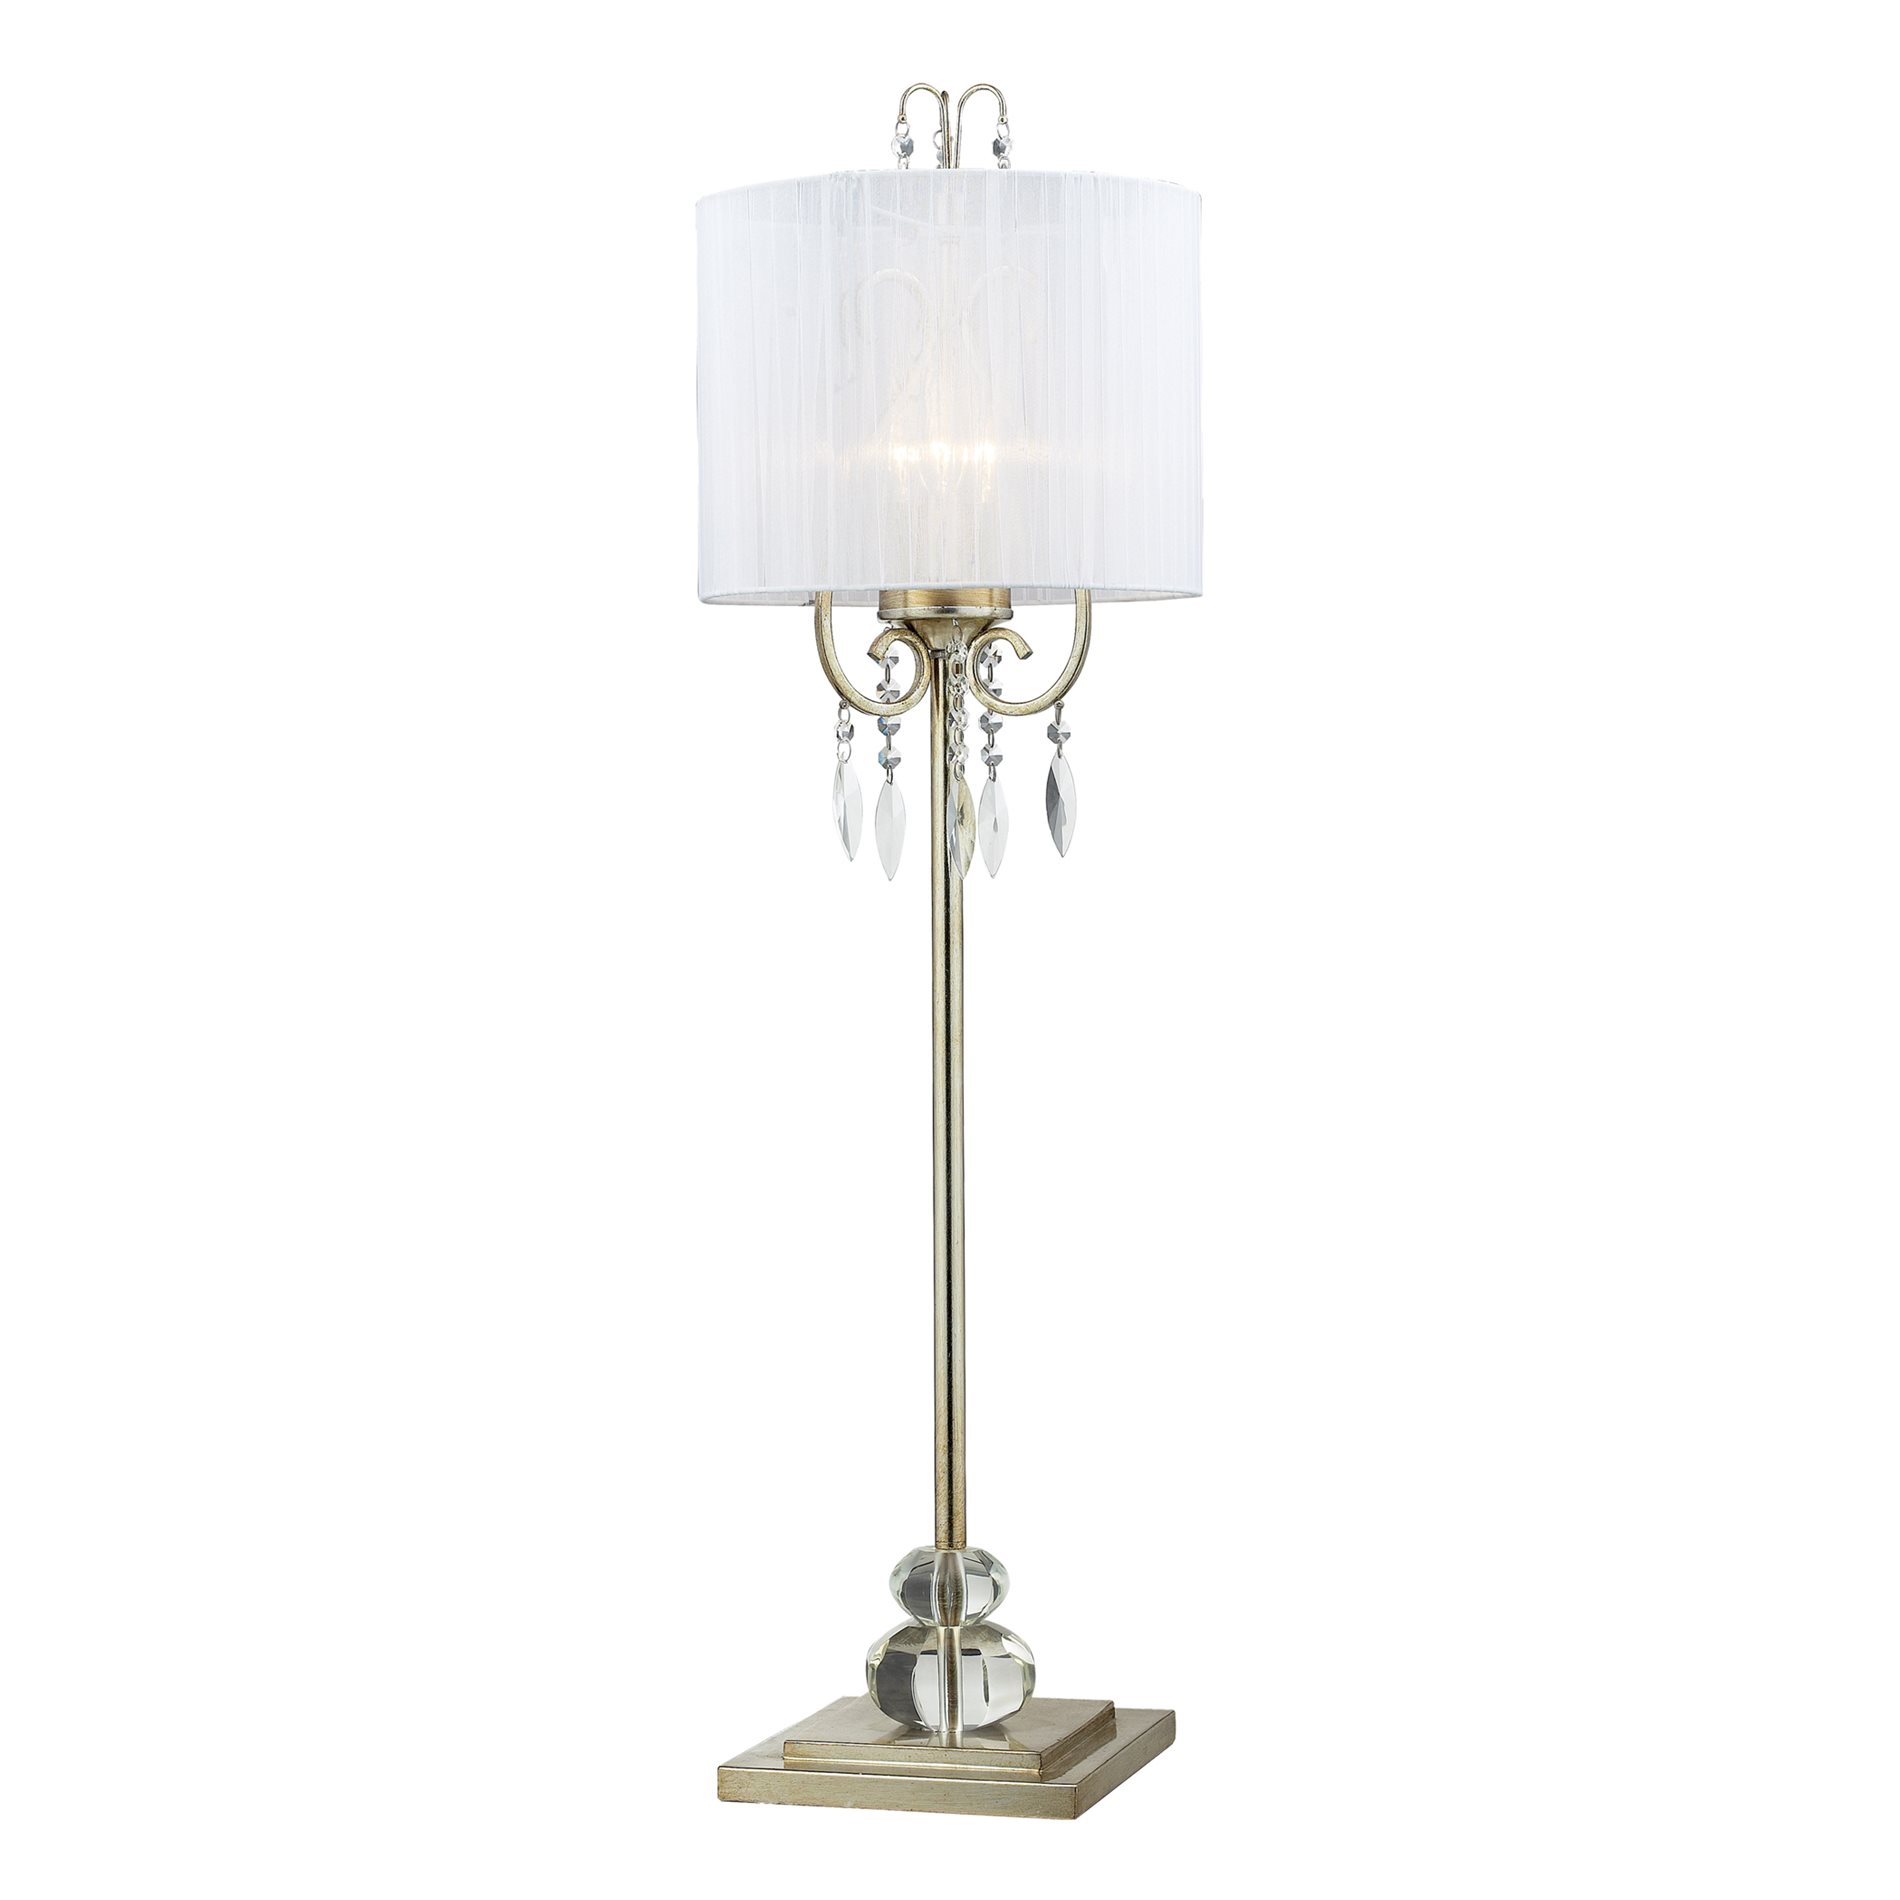 Dimond D2217 Albion Transitional Crystal Buffet Lamp D2217